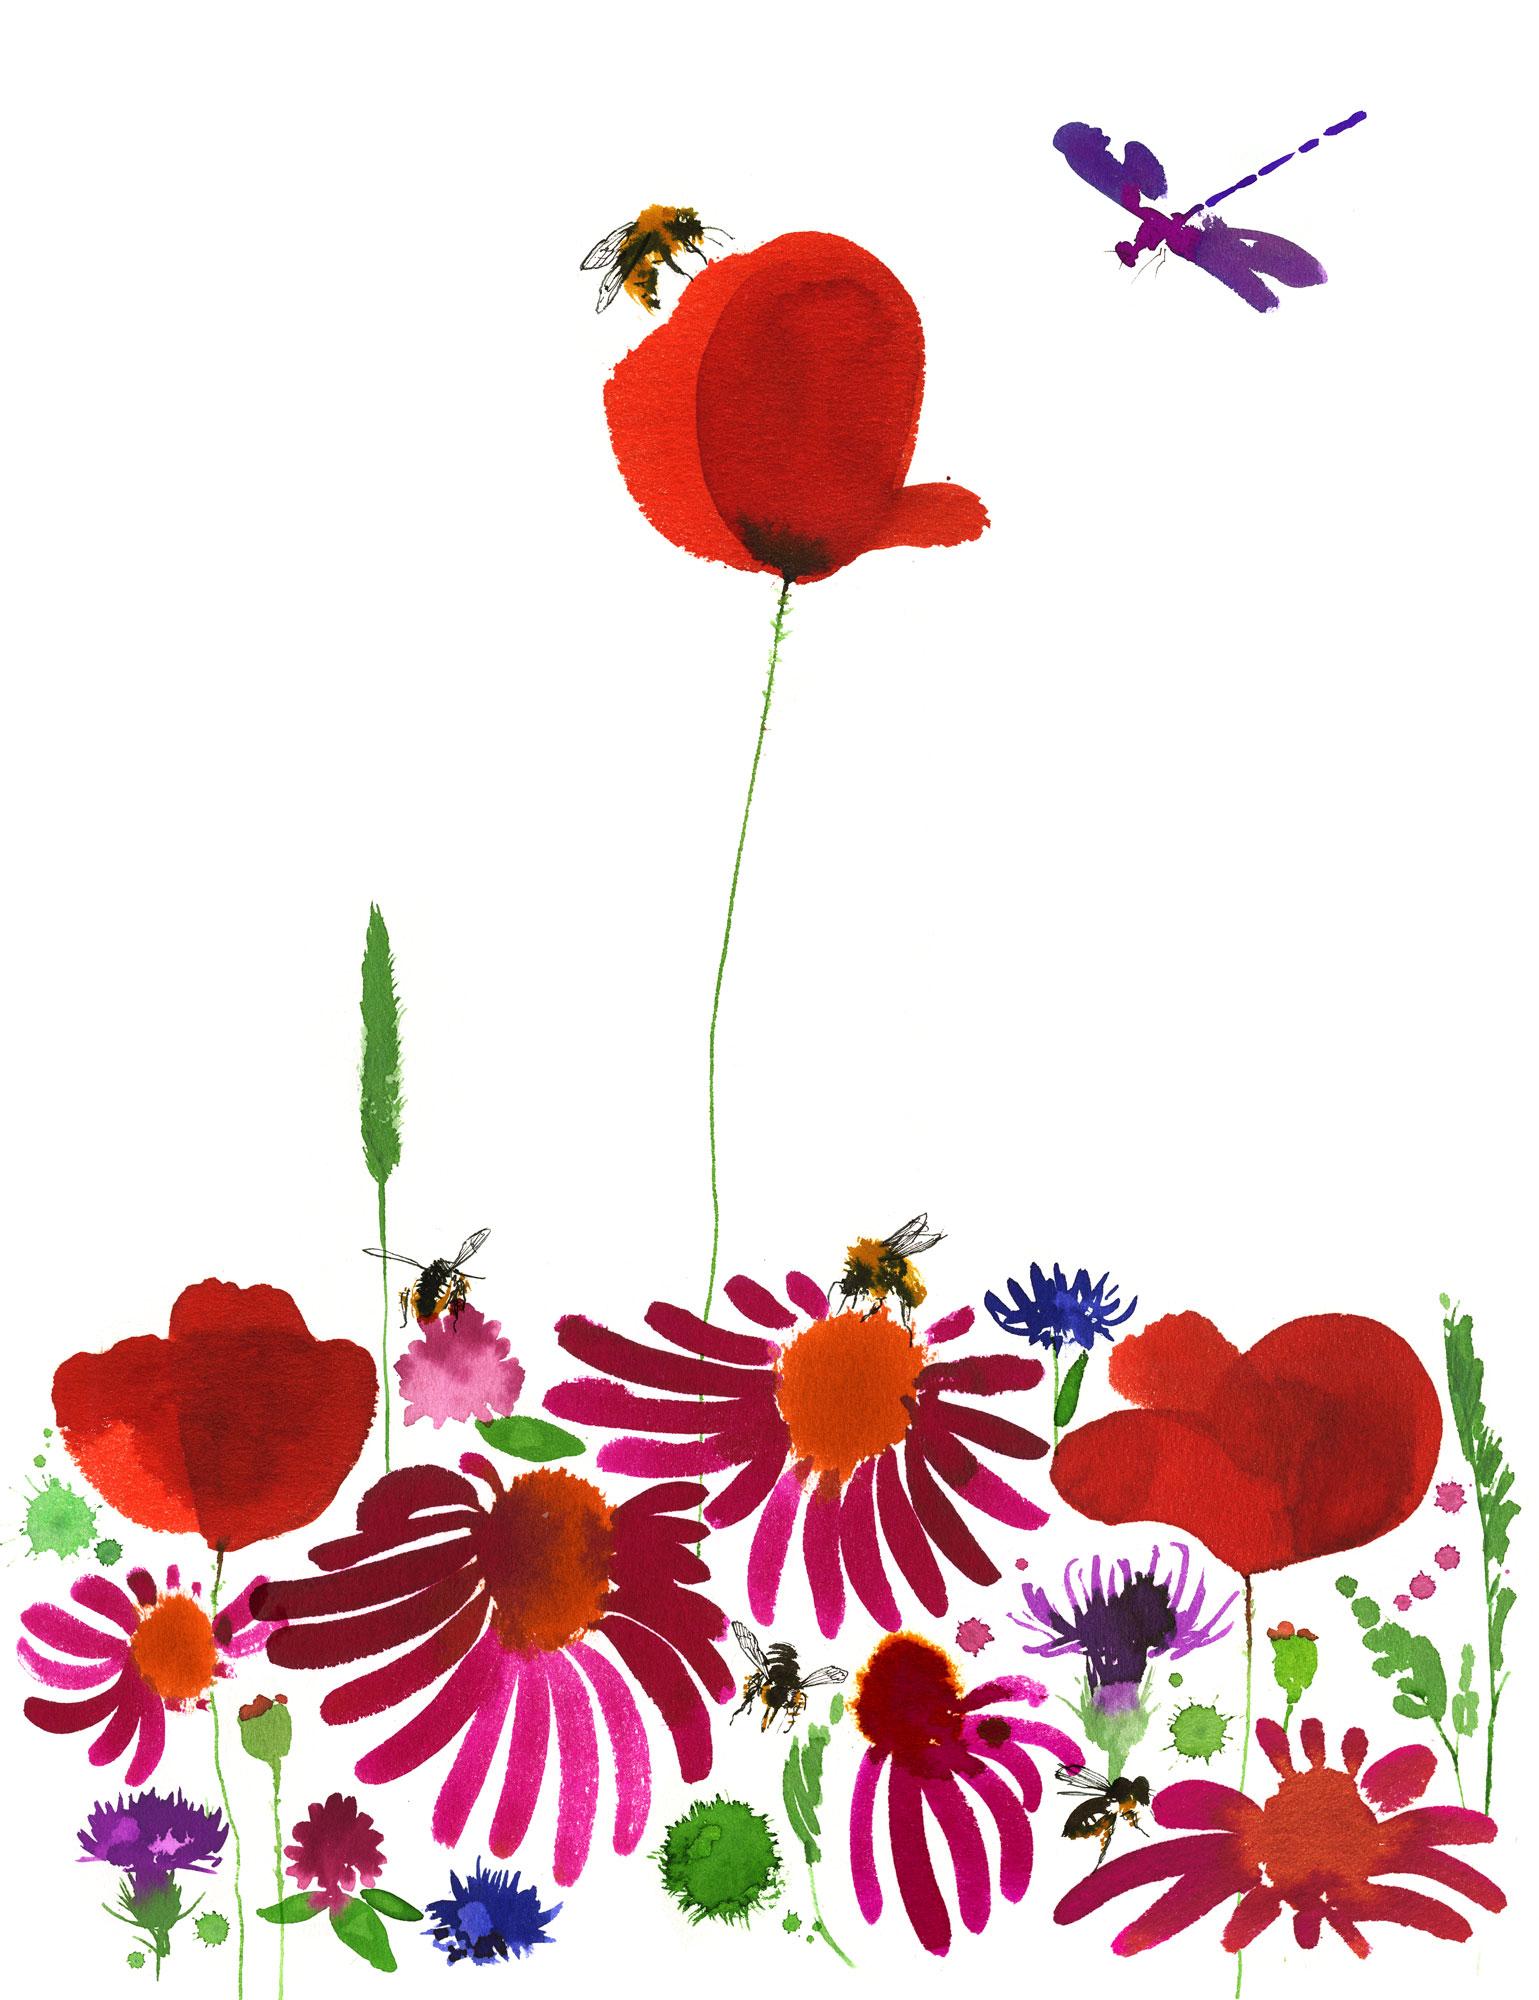 Lovisa-Burfitt-illustration Champs-de-fleurs